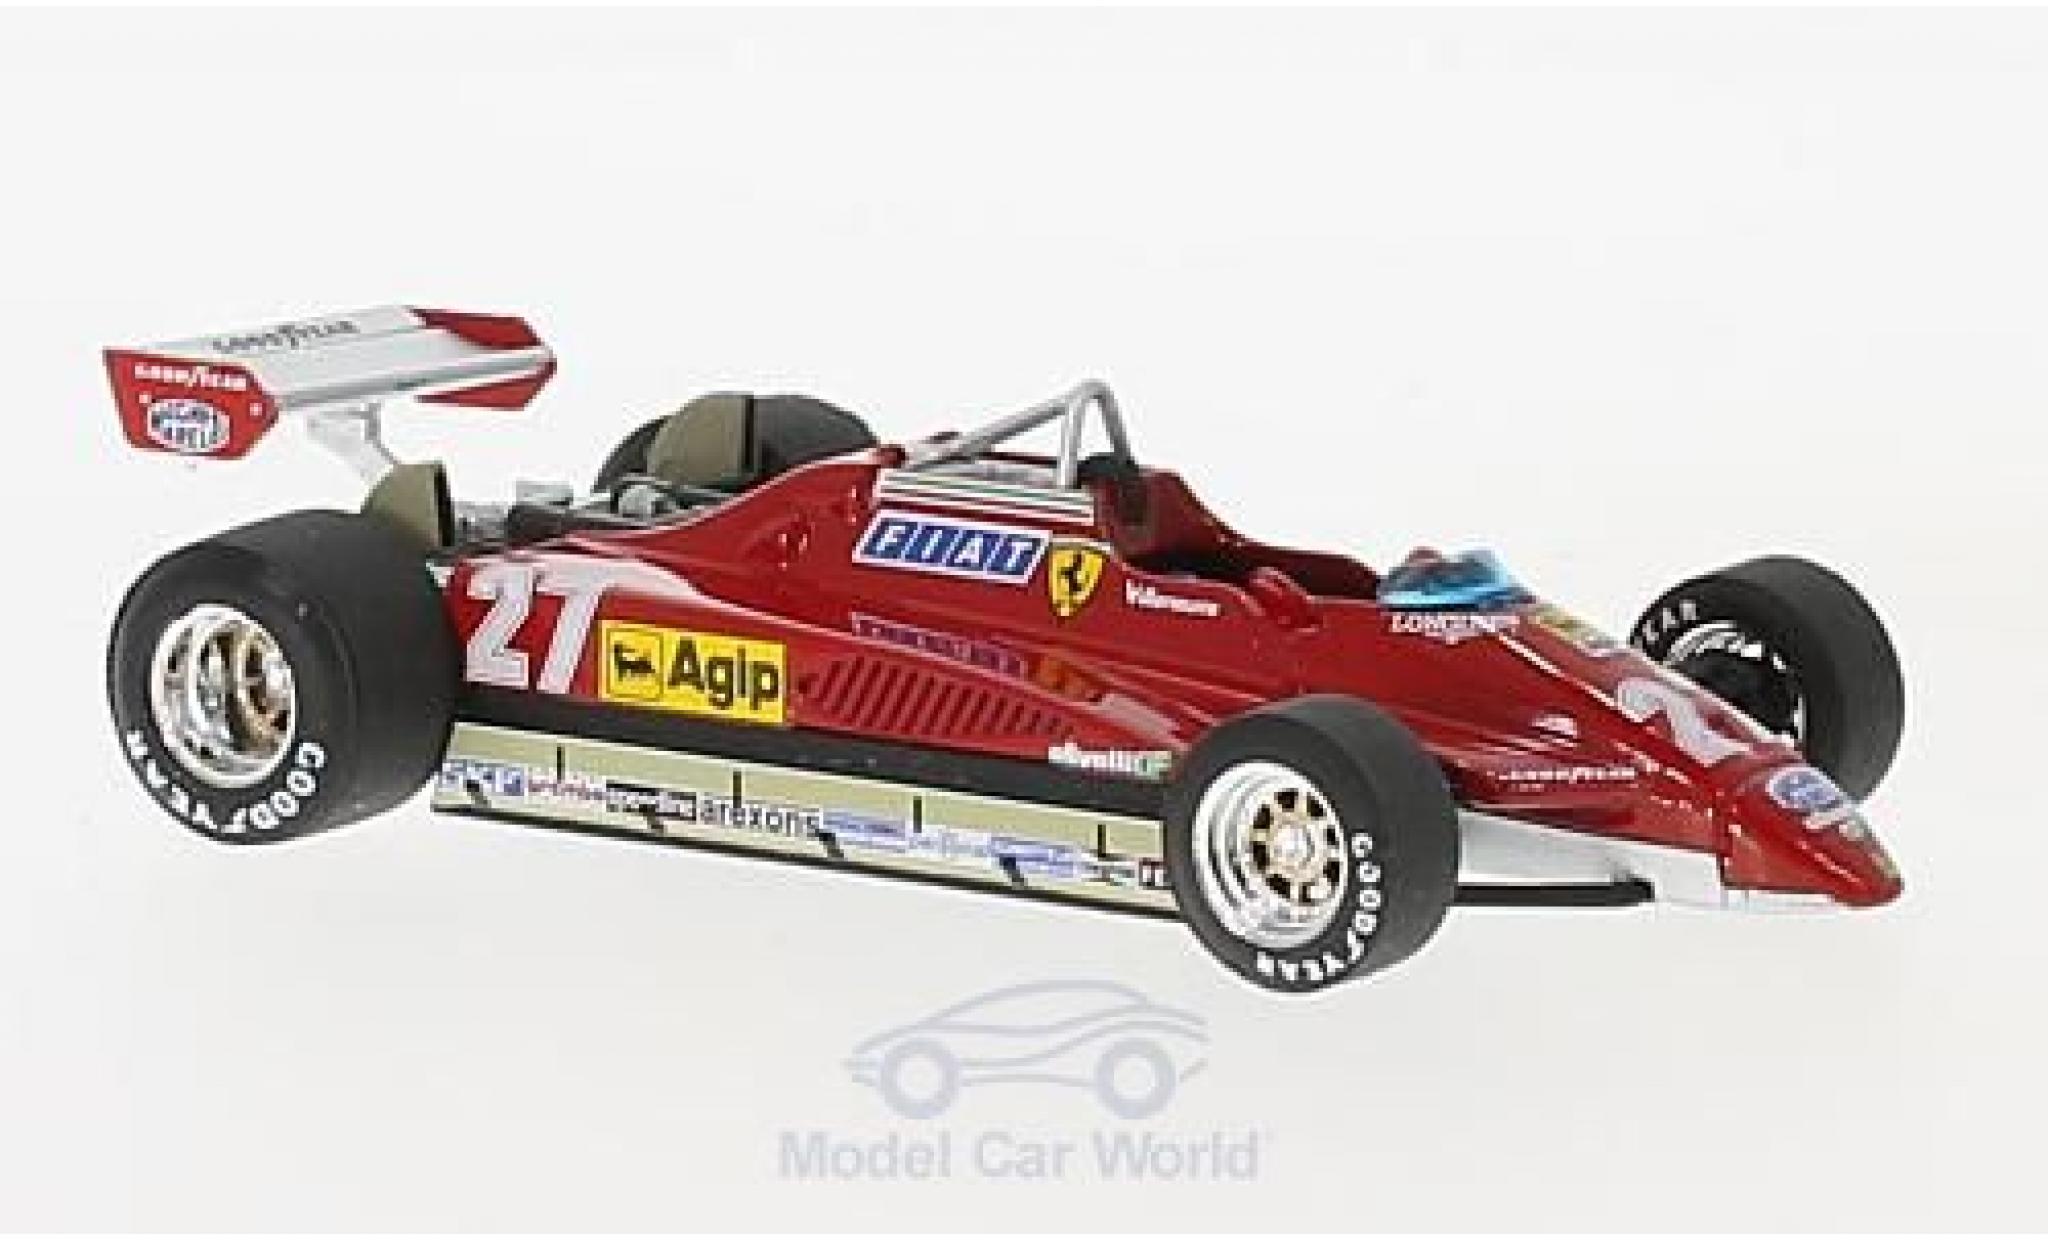 Ferrari 126 1982 1/43 Brumm C2 Turbo No.27 Formel 1 GP San Marino 1982 G.Villeneuve